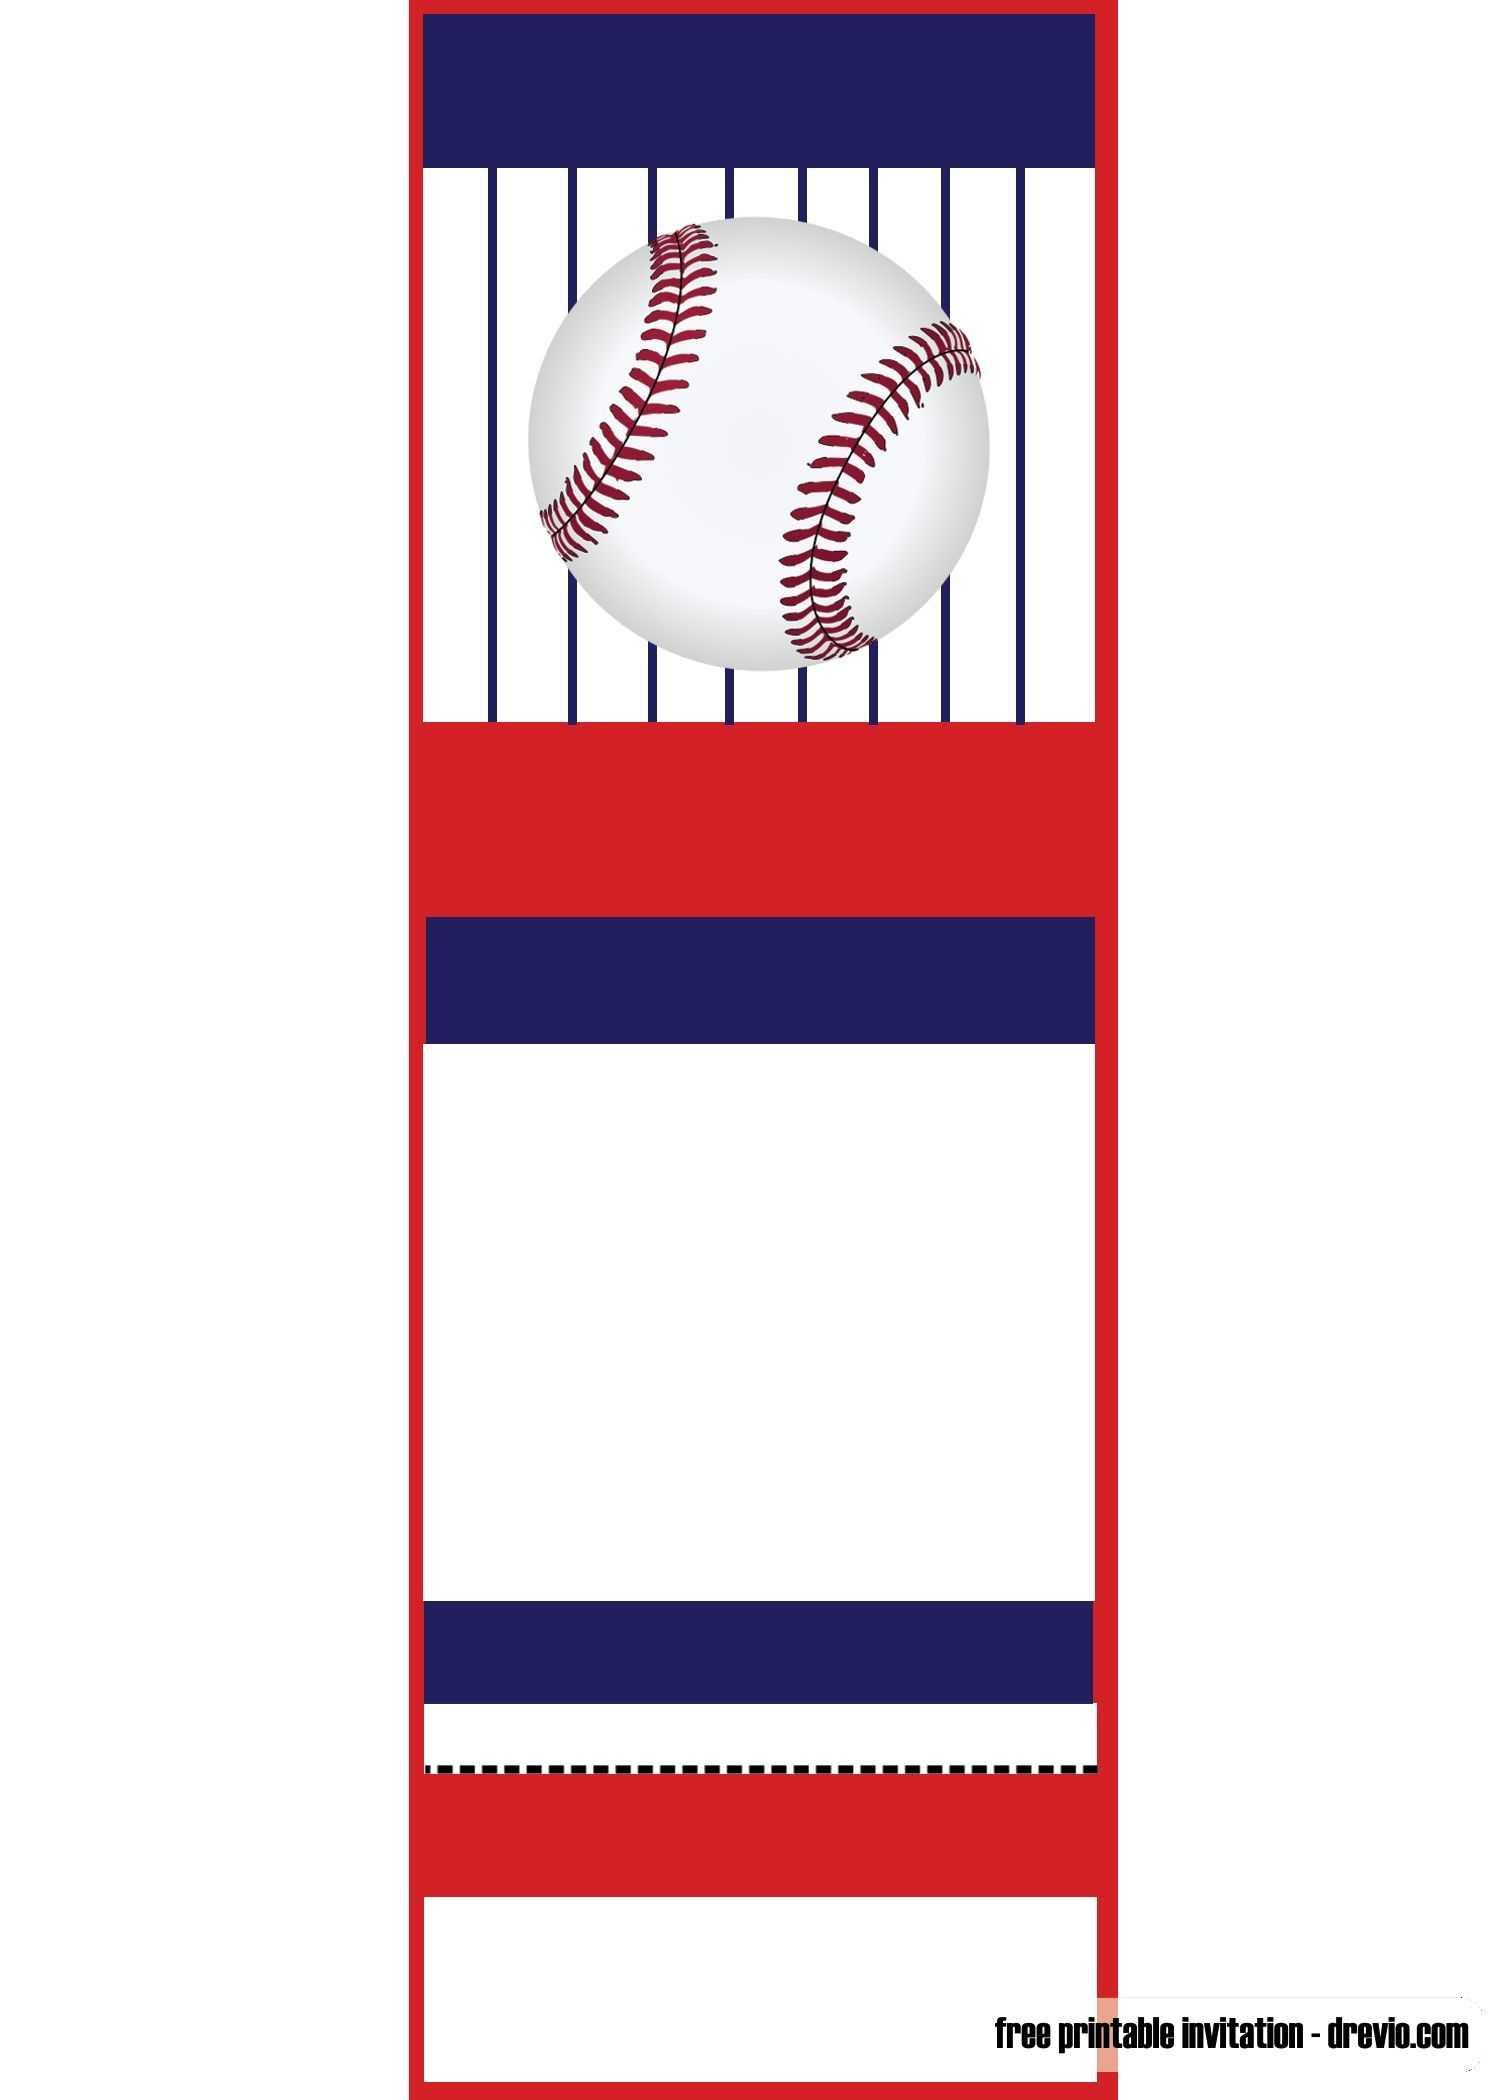 024 Template Ideas Baseball Card Beautiful Word Size Trading For Baseball Card Size Template